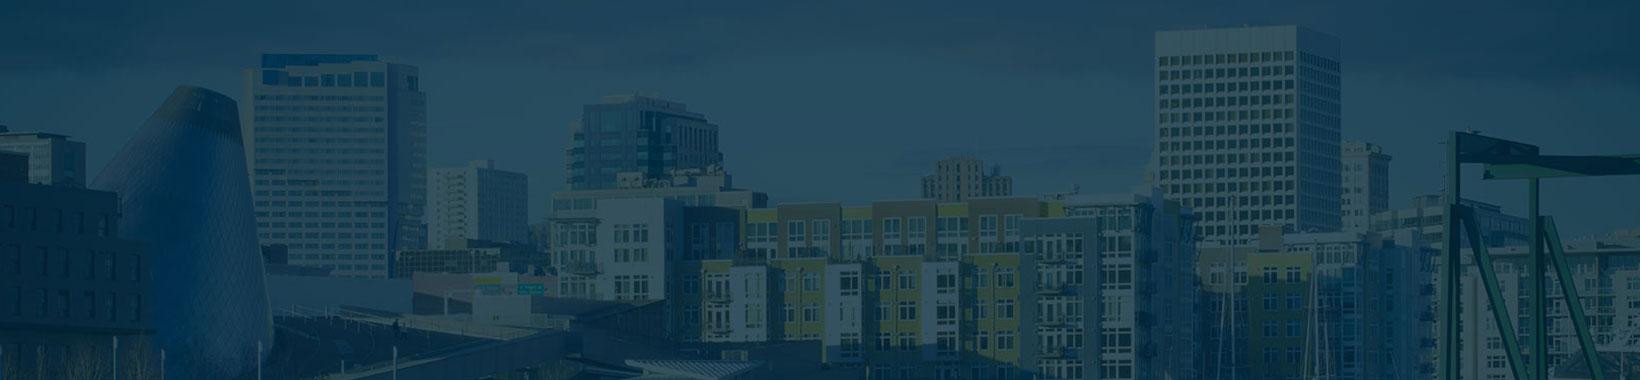 Commercial Rental Image